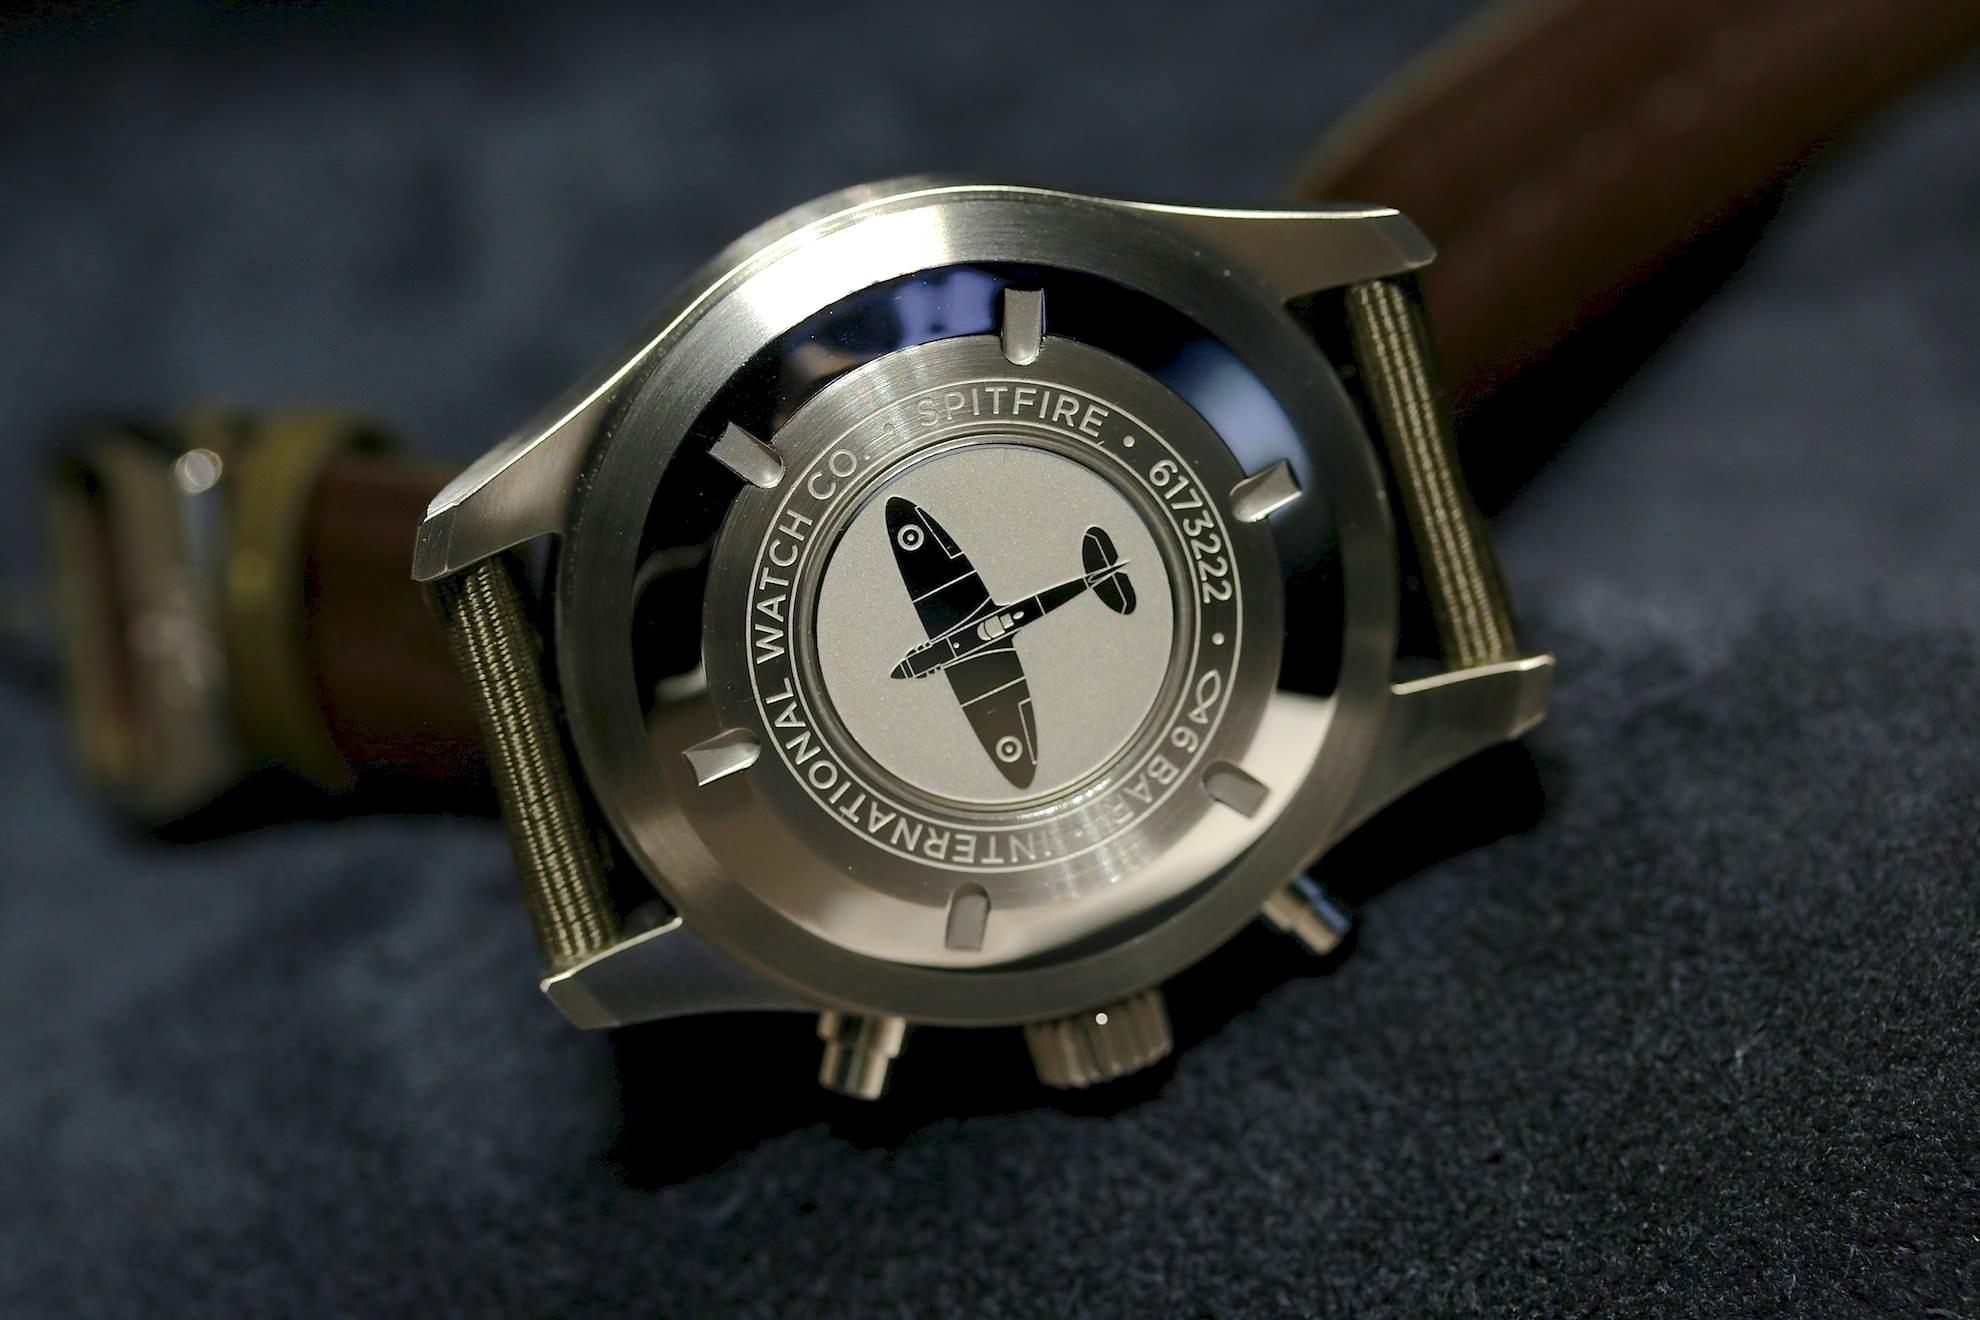 IWC_Pilots_Watch_Chronograph_Spitfire_4